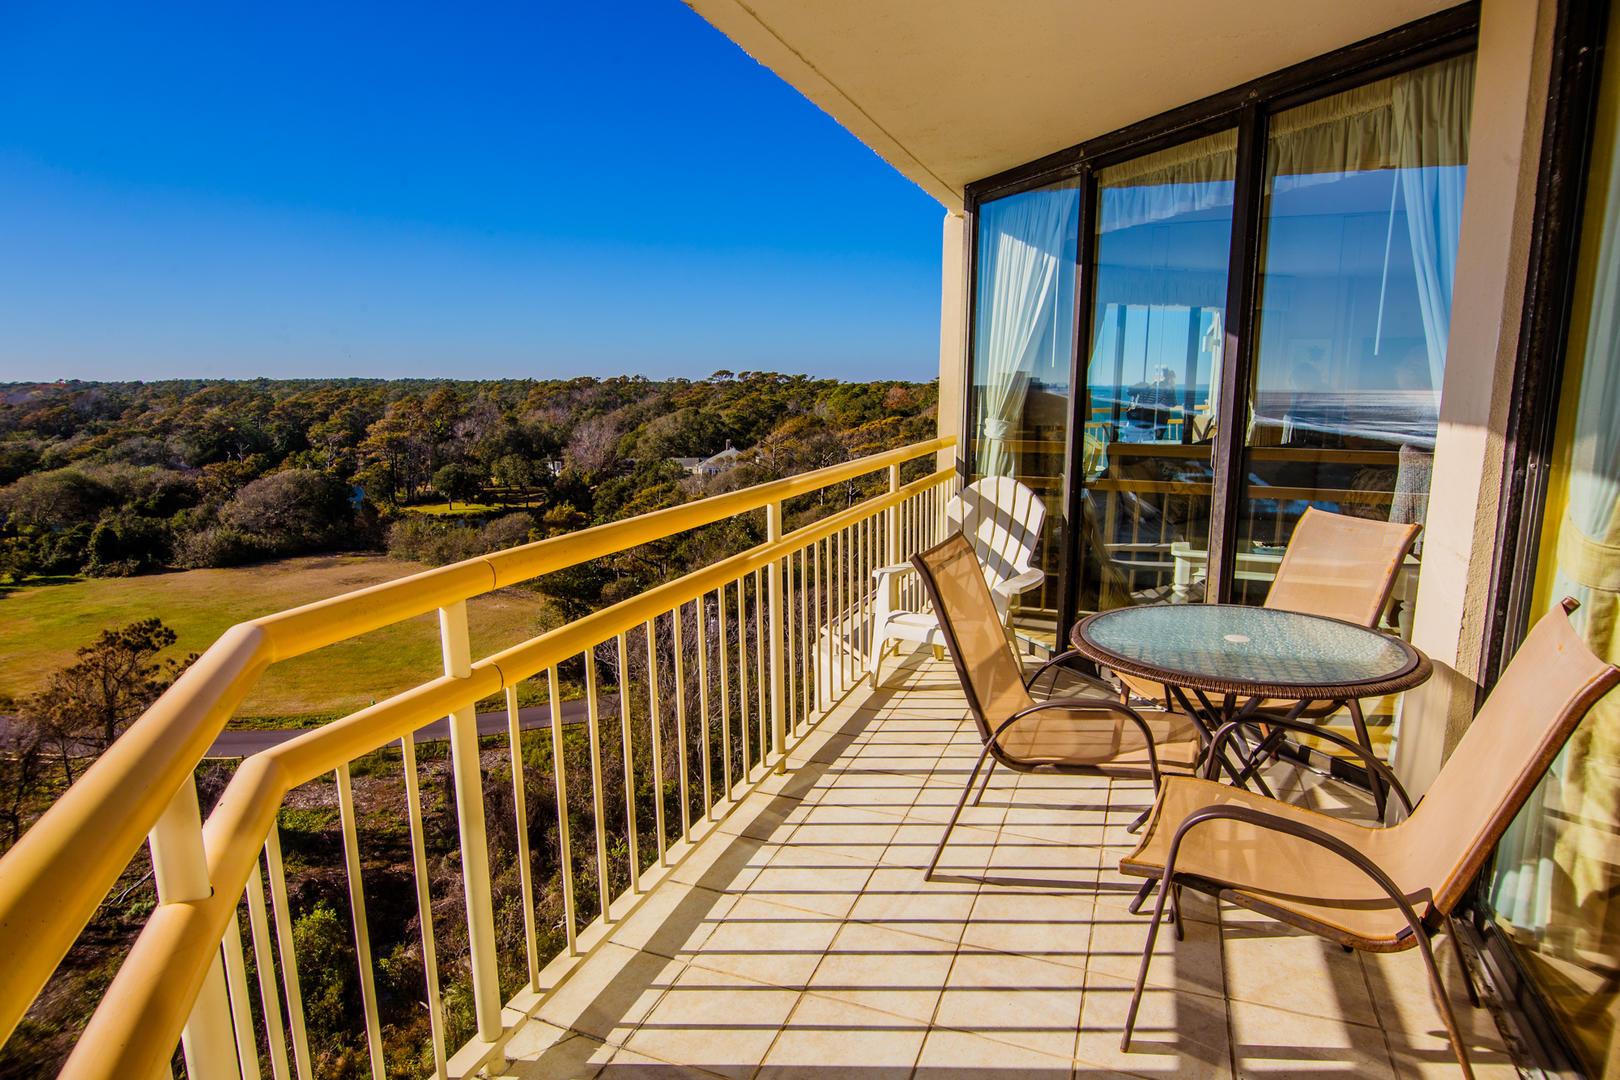 Ocean Creek NN9 - Balcony with Ocean View